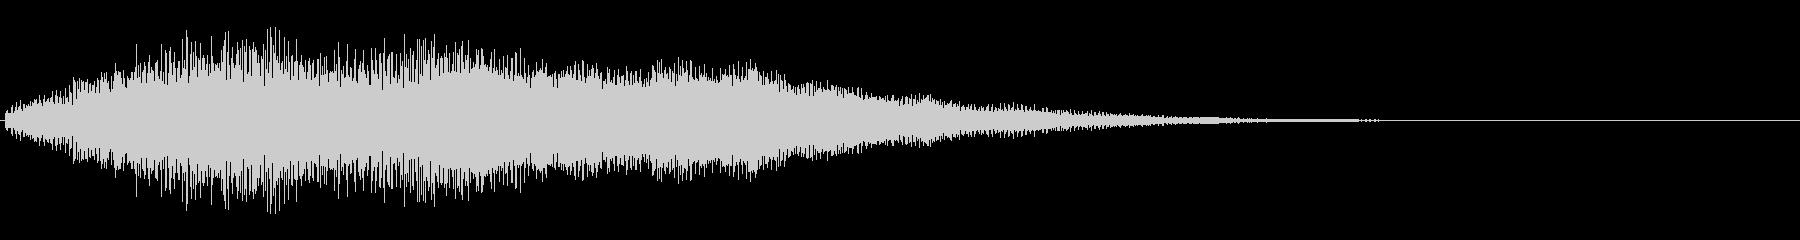 Dark_Attack-21の未再生の波形